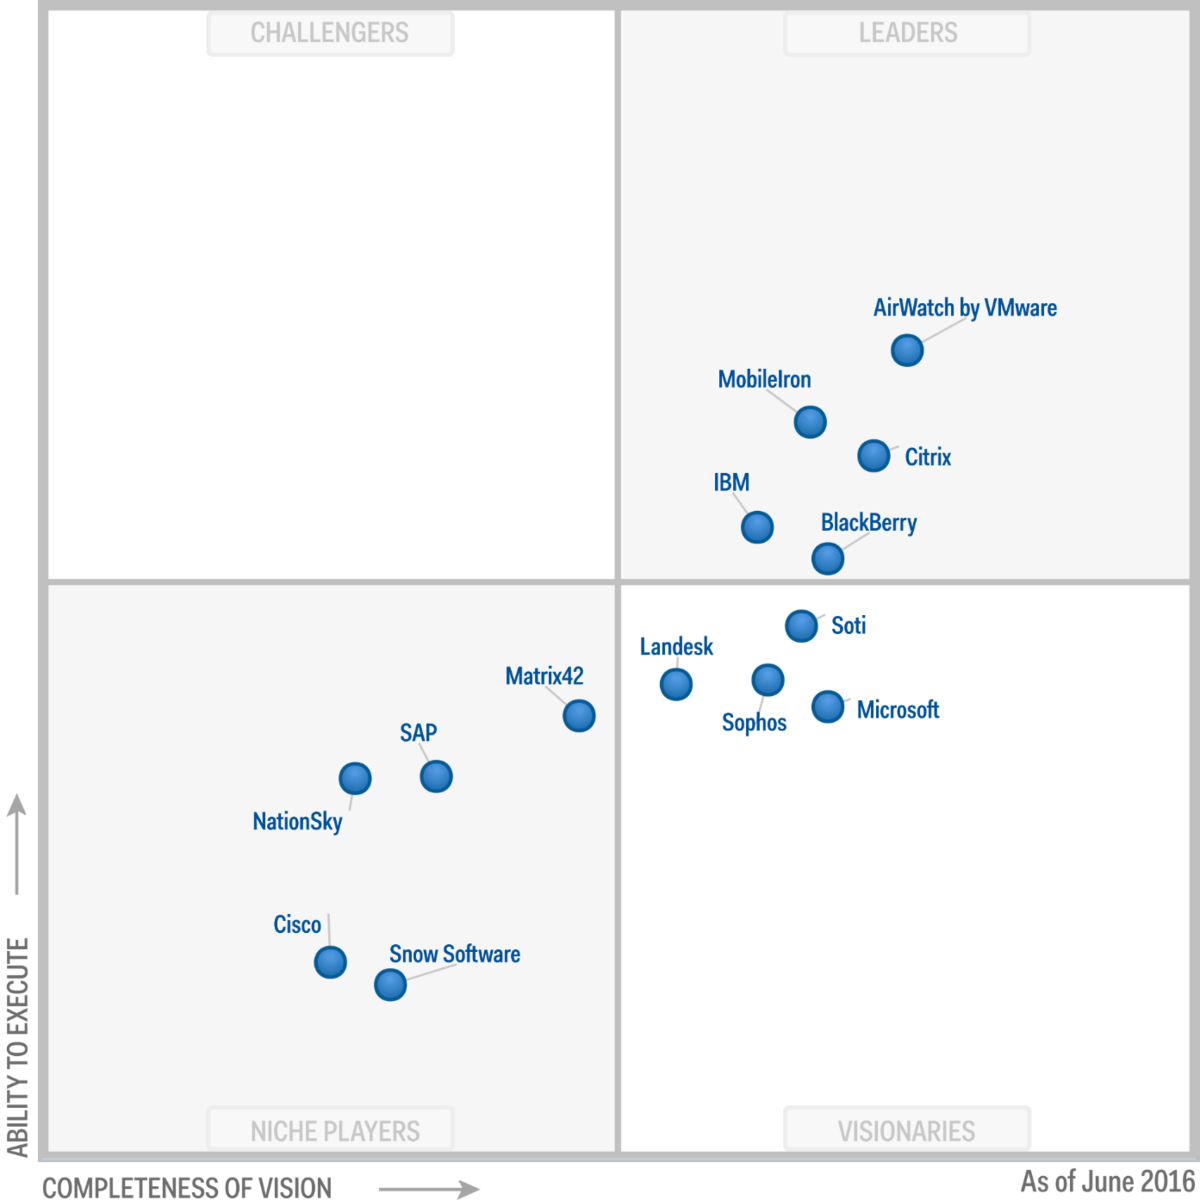 BlackBerry named a Leader in the Gartner Magic Quadrant for EMM Suites